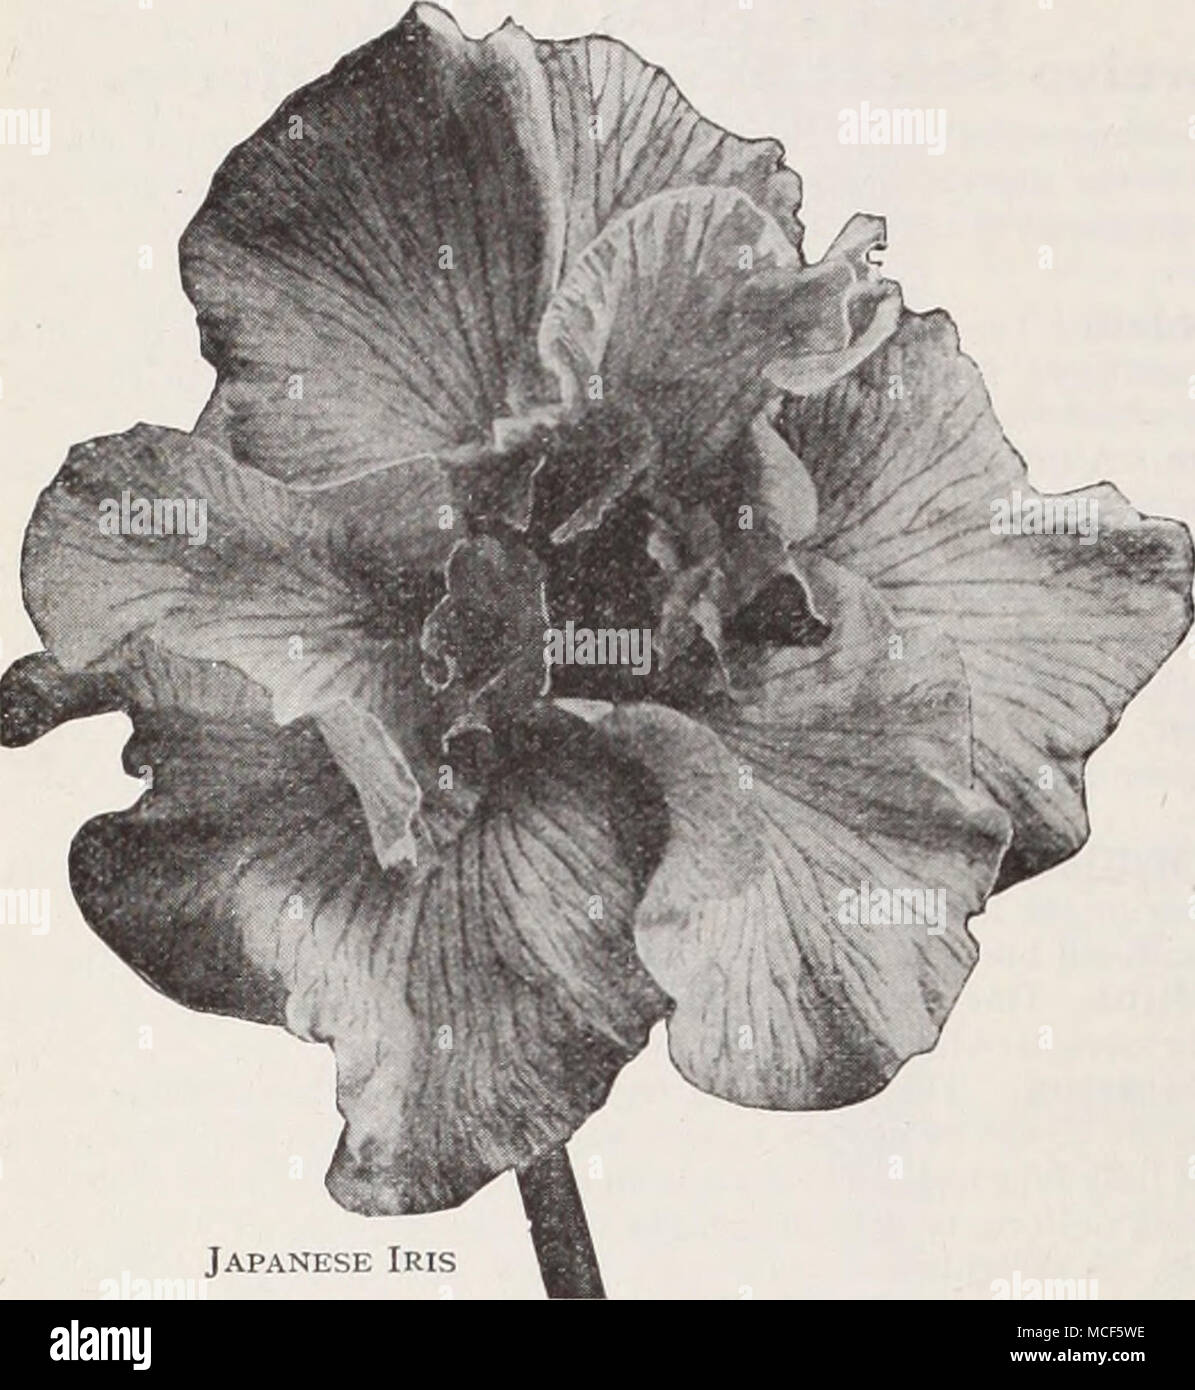 Japanese Iris Japanese Iris Iris Kaempferi The Improved Forms Of